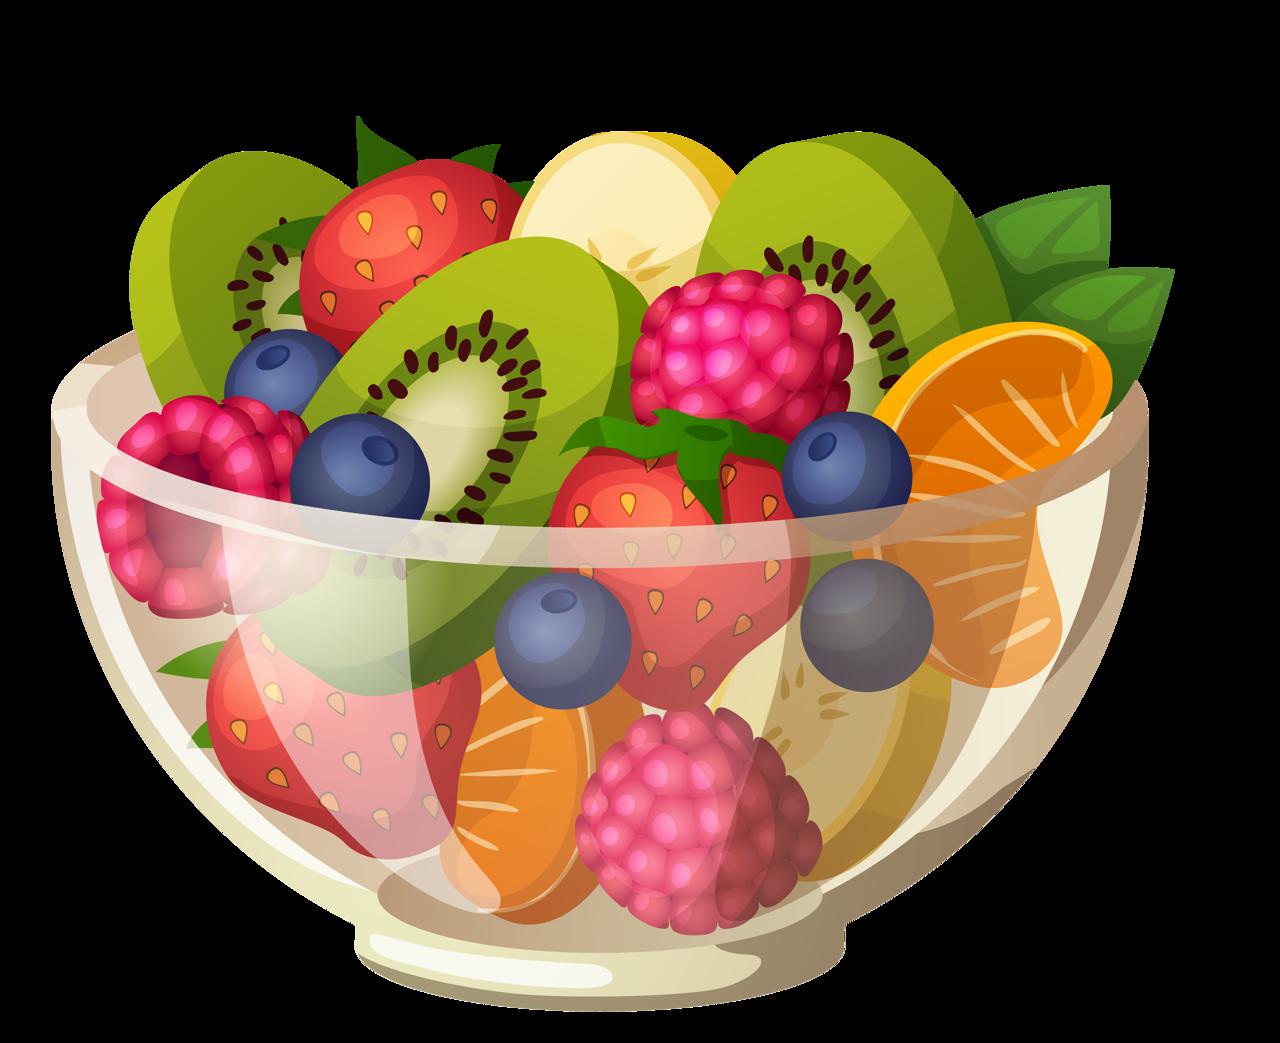 shutterstock clipart pinterest fruta alimentos y verduras. Black Bedroom Furniture Sets. Home Design Ideas